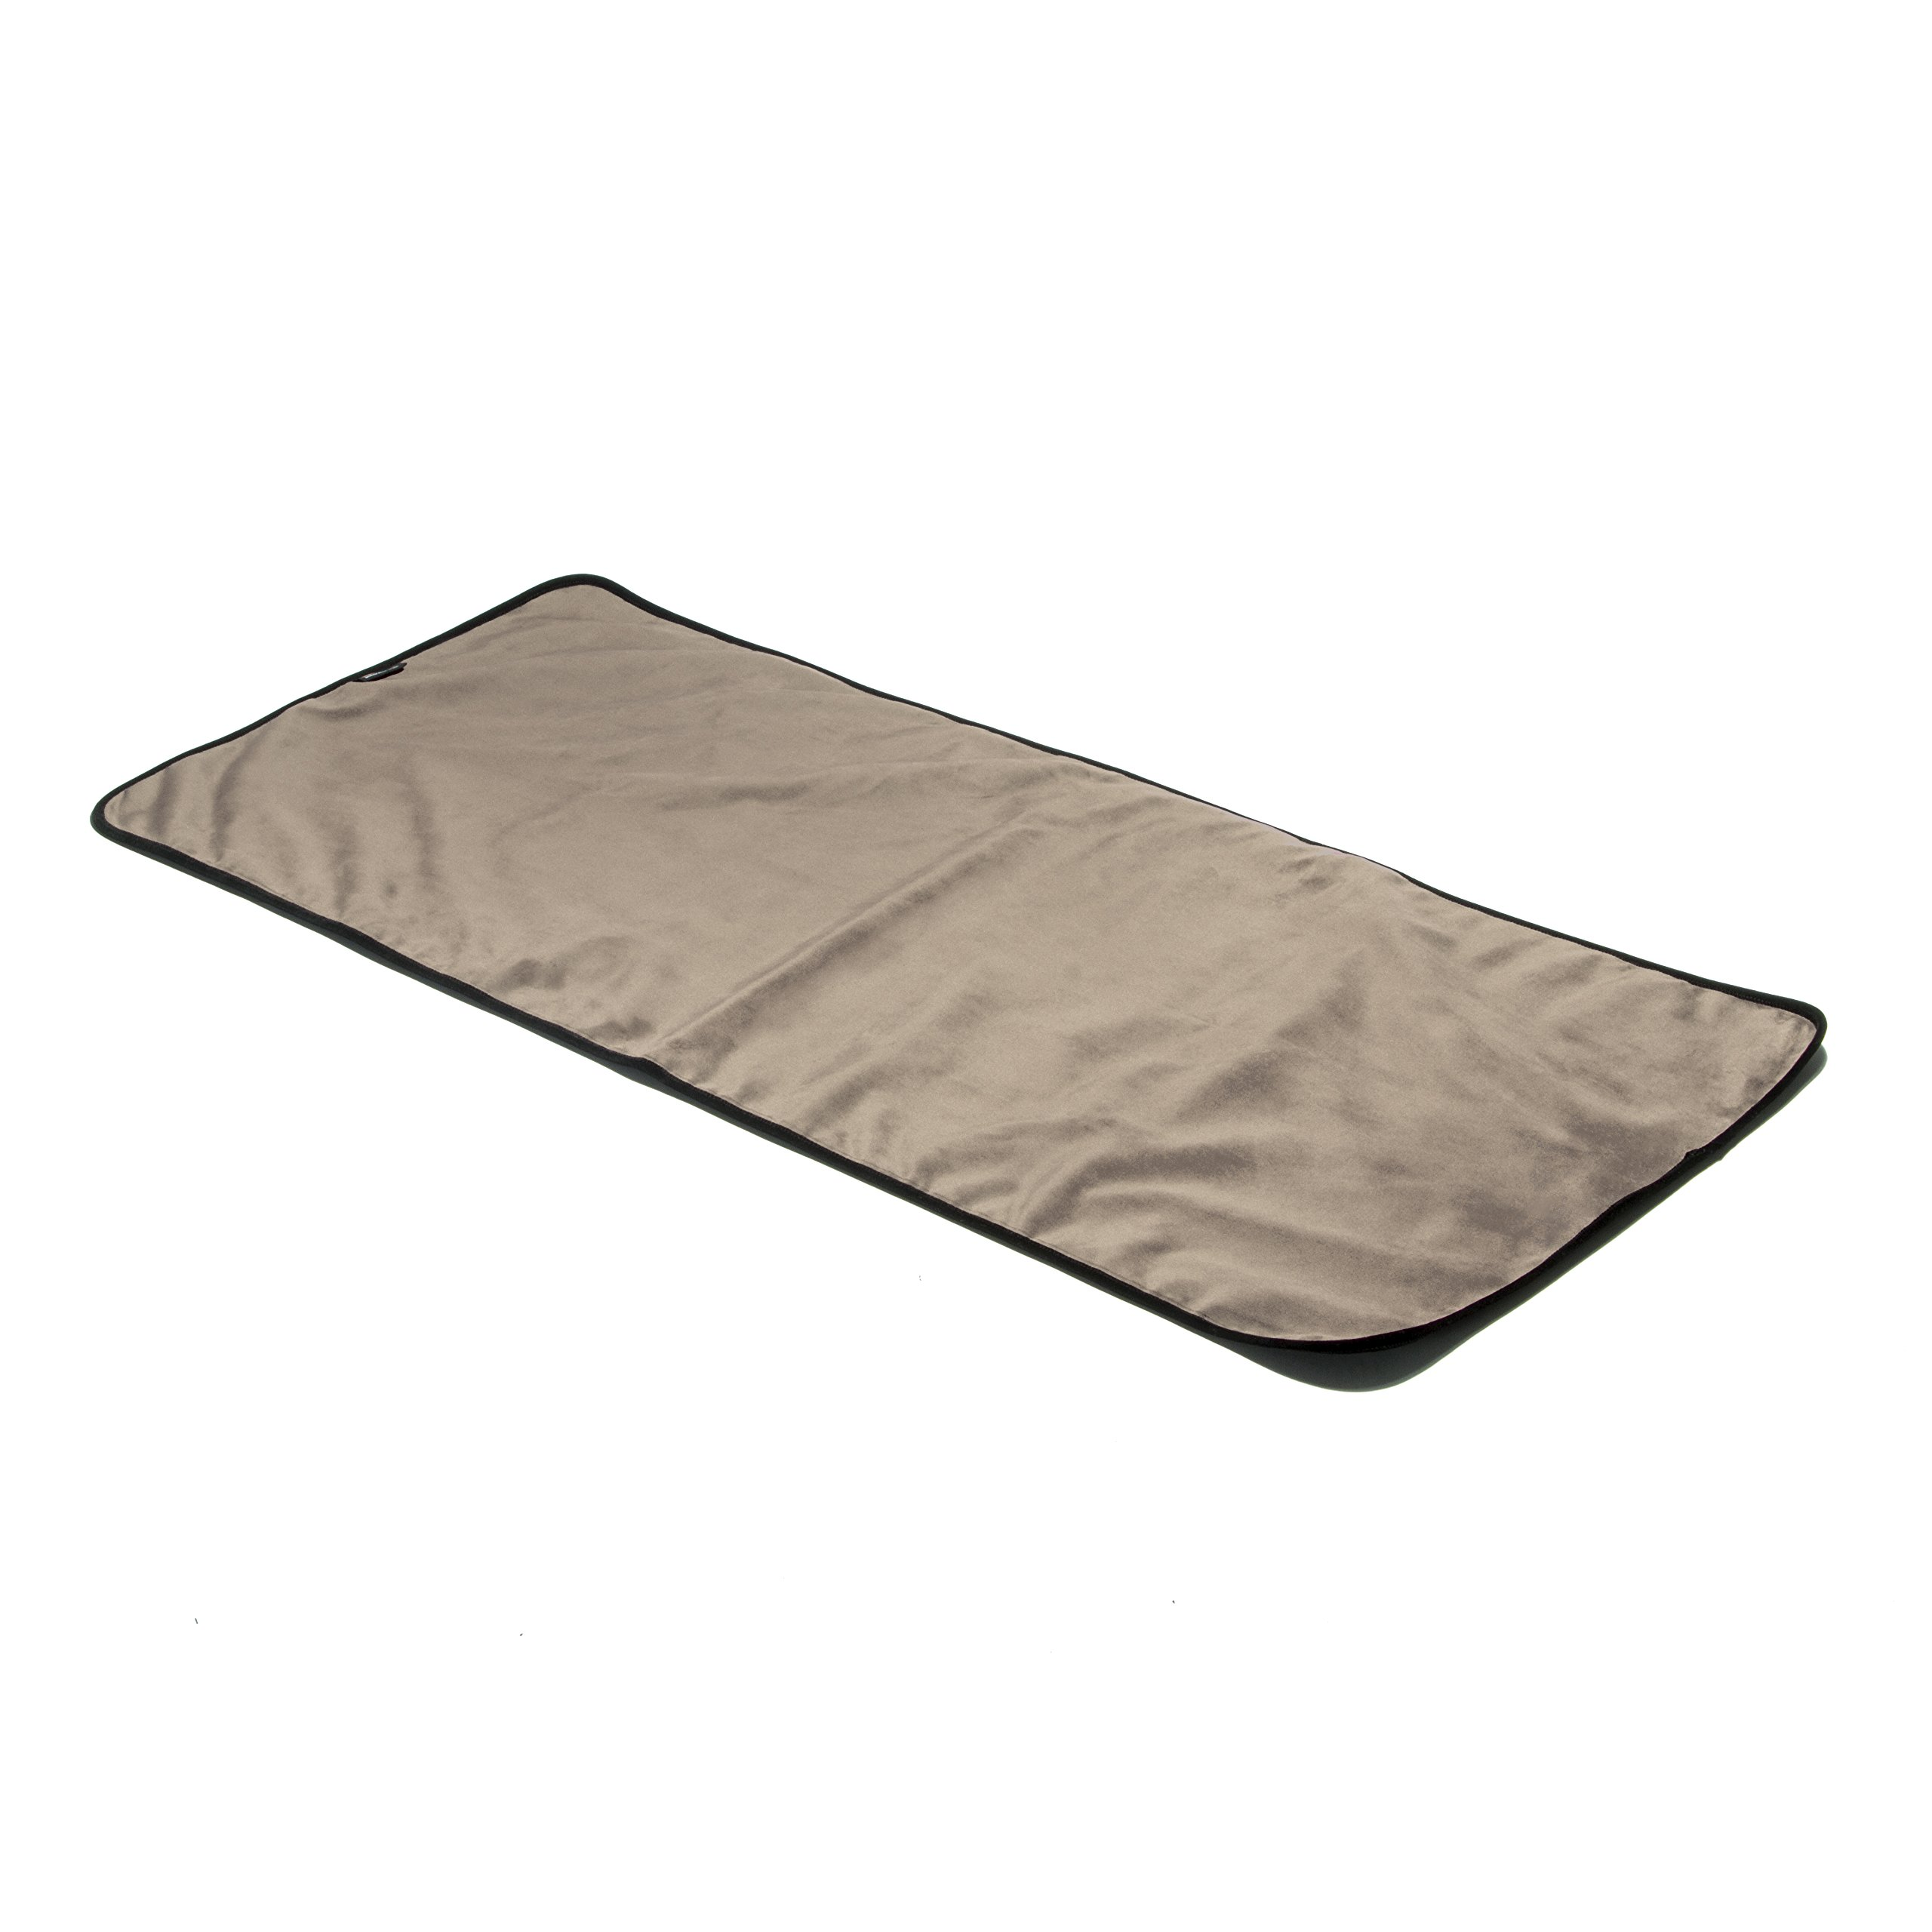 Liberator Throe Moisture Resistant Sex Blanket, Travel-Size, Buckwheat